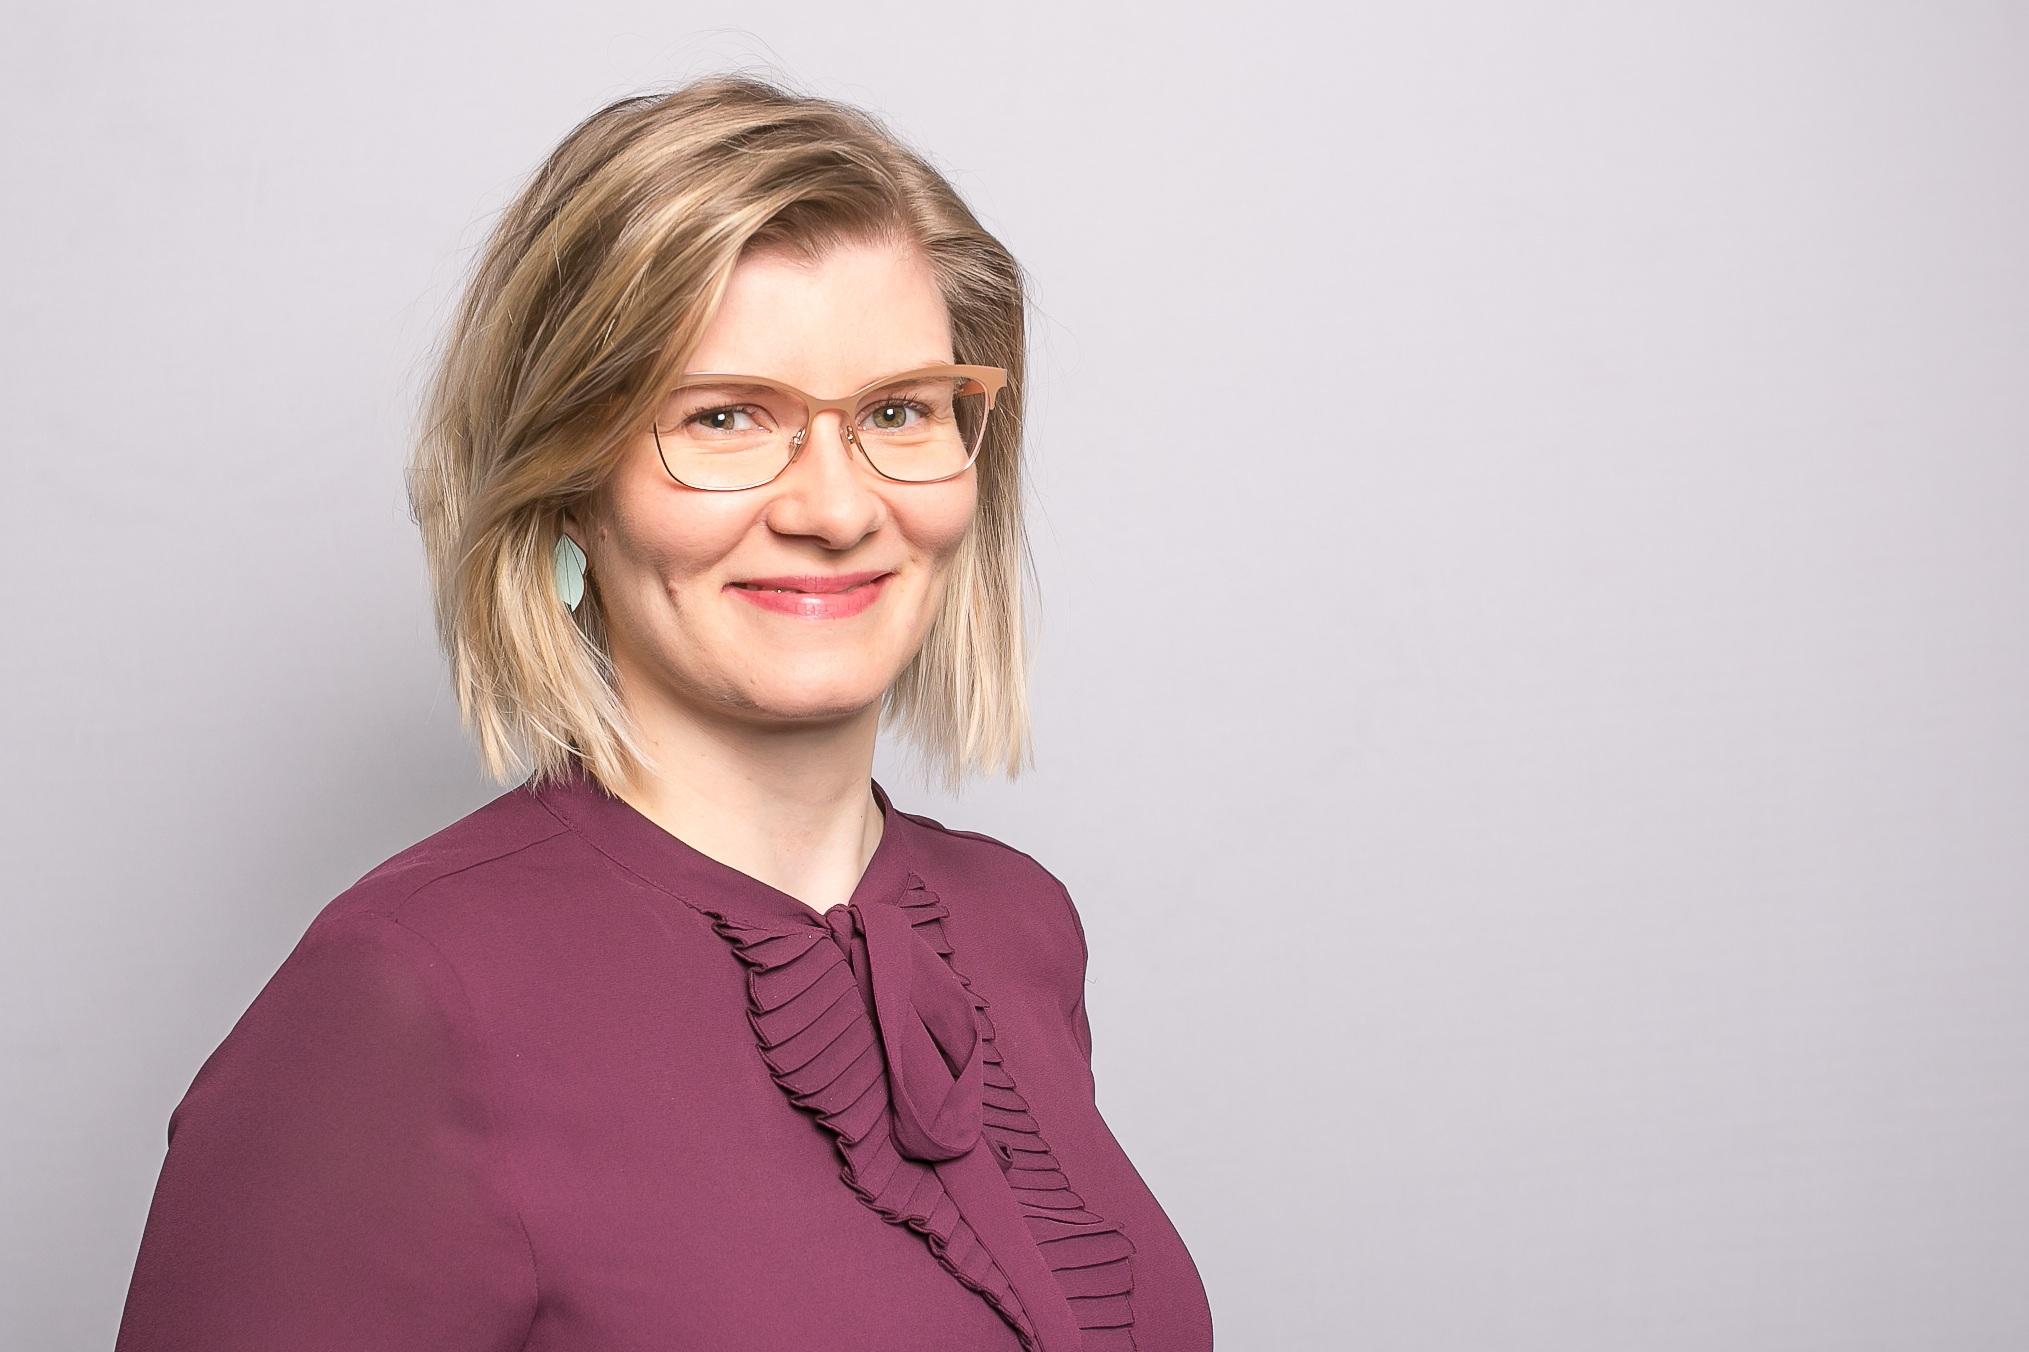 Ulpu Tapanainen  Administrative Director  0400 362 822   ulpu.tapanainen@springvest.fi